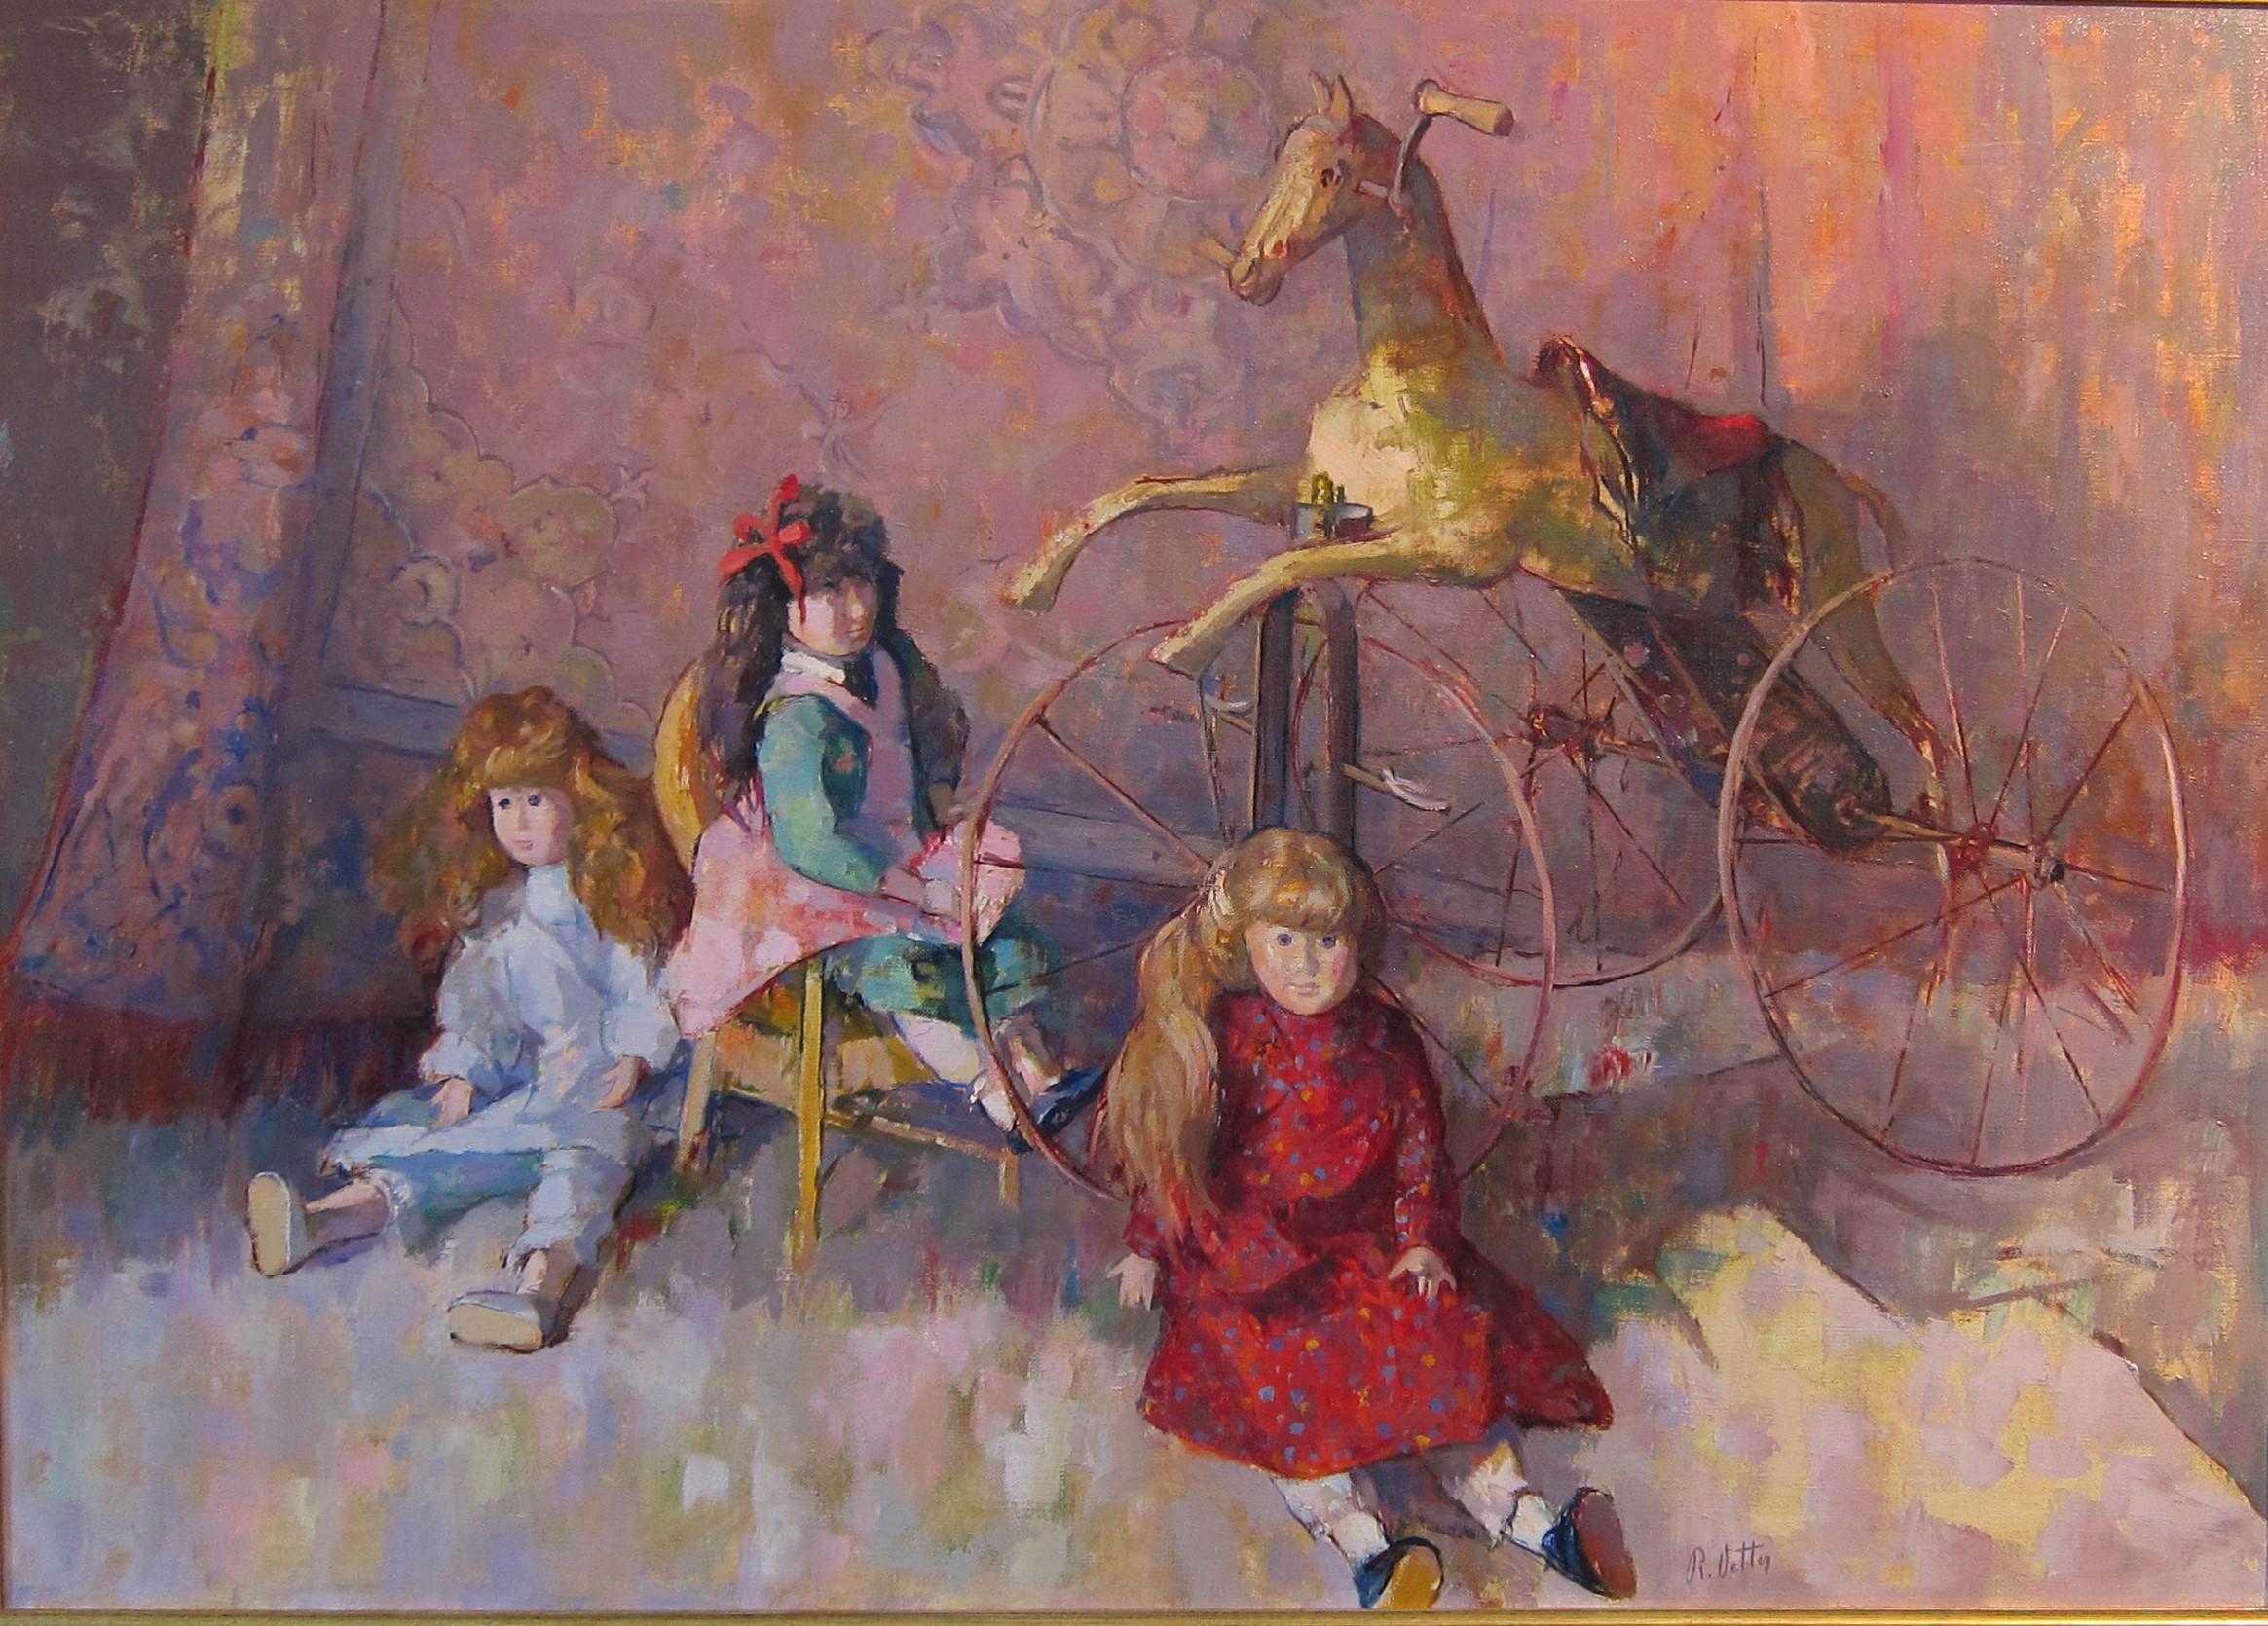 Jouets anciens (1990).